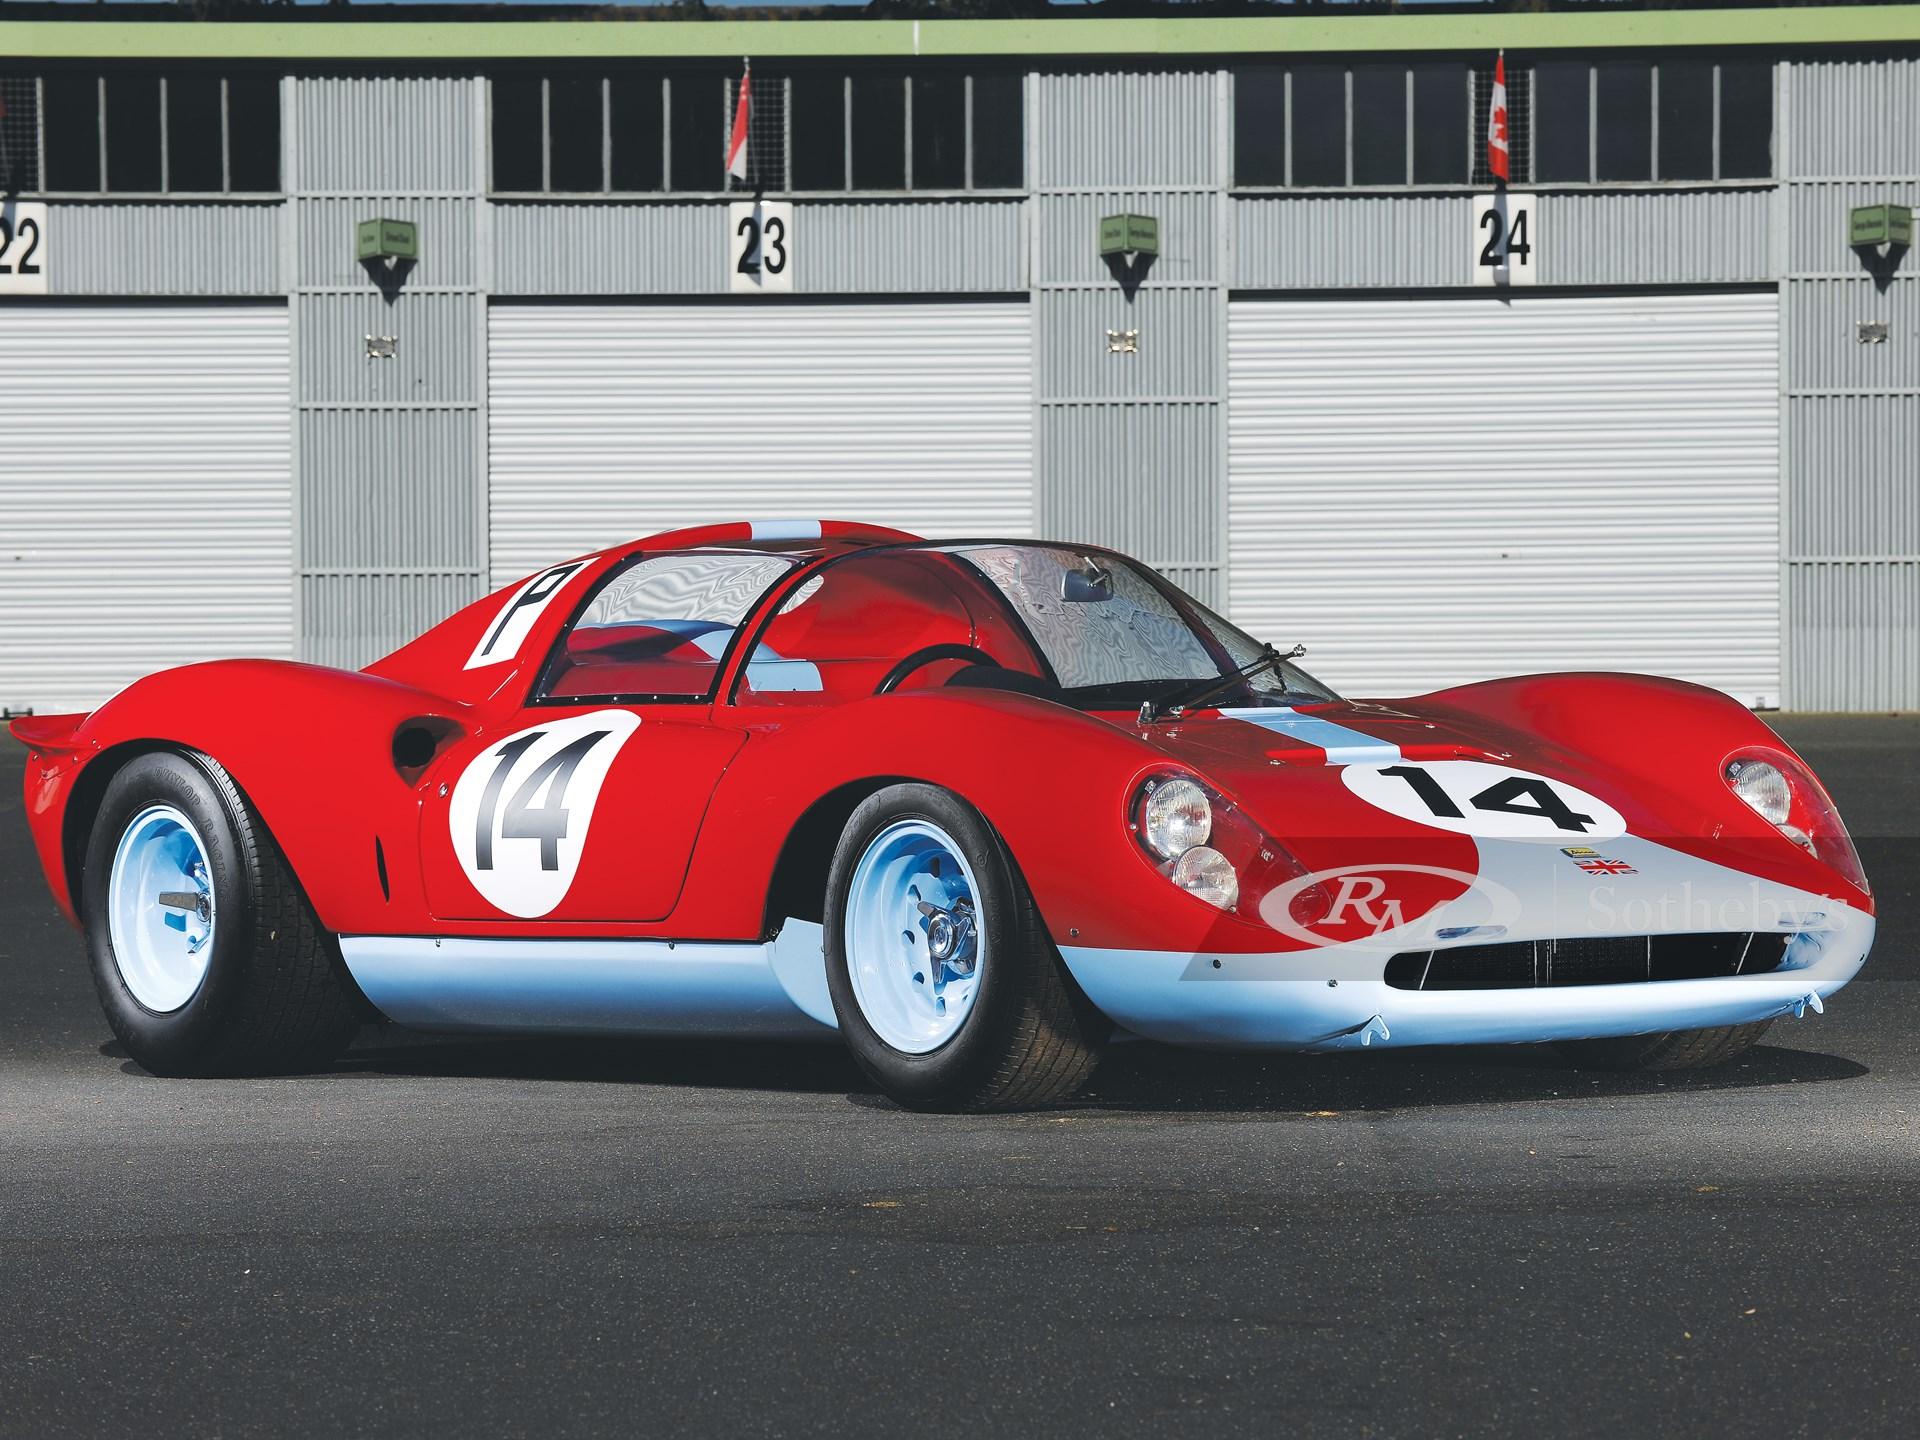 1966 Ferrari 206 S Dino Spyder by Carrozzeria Sports Cars   Monaco 2012    RM Sotheby's